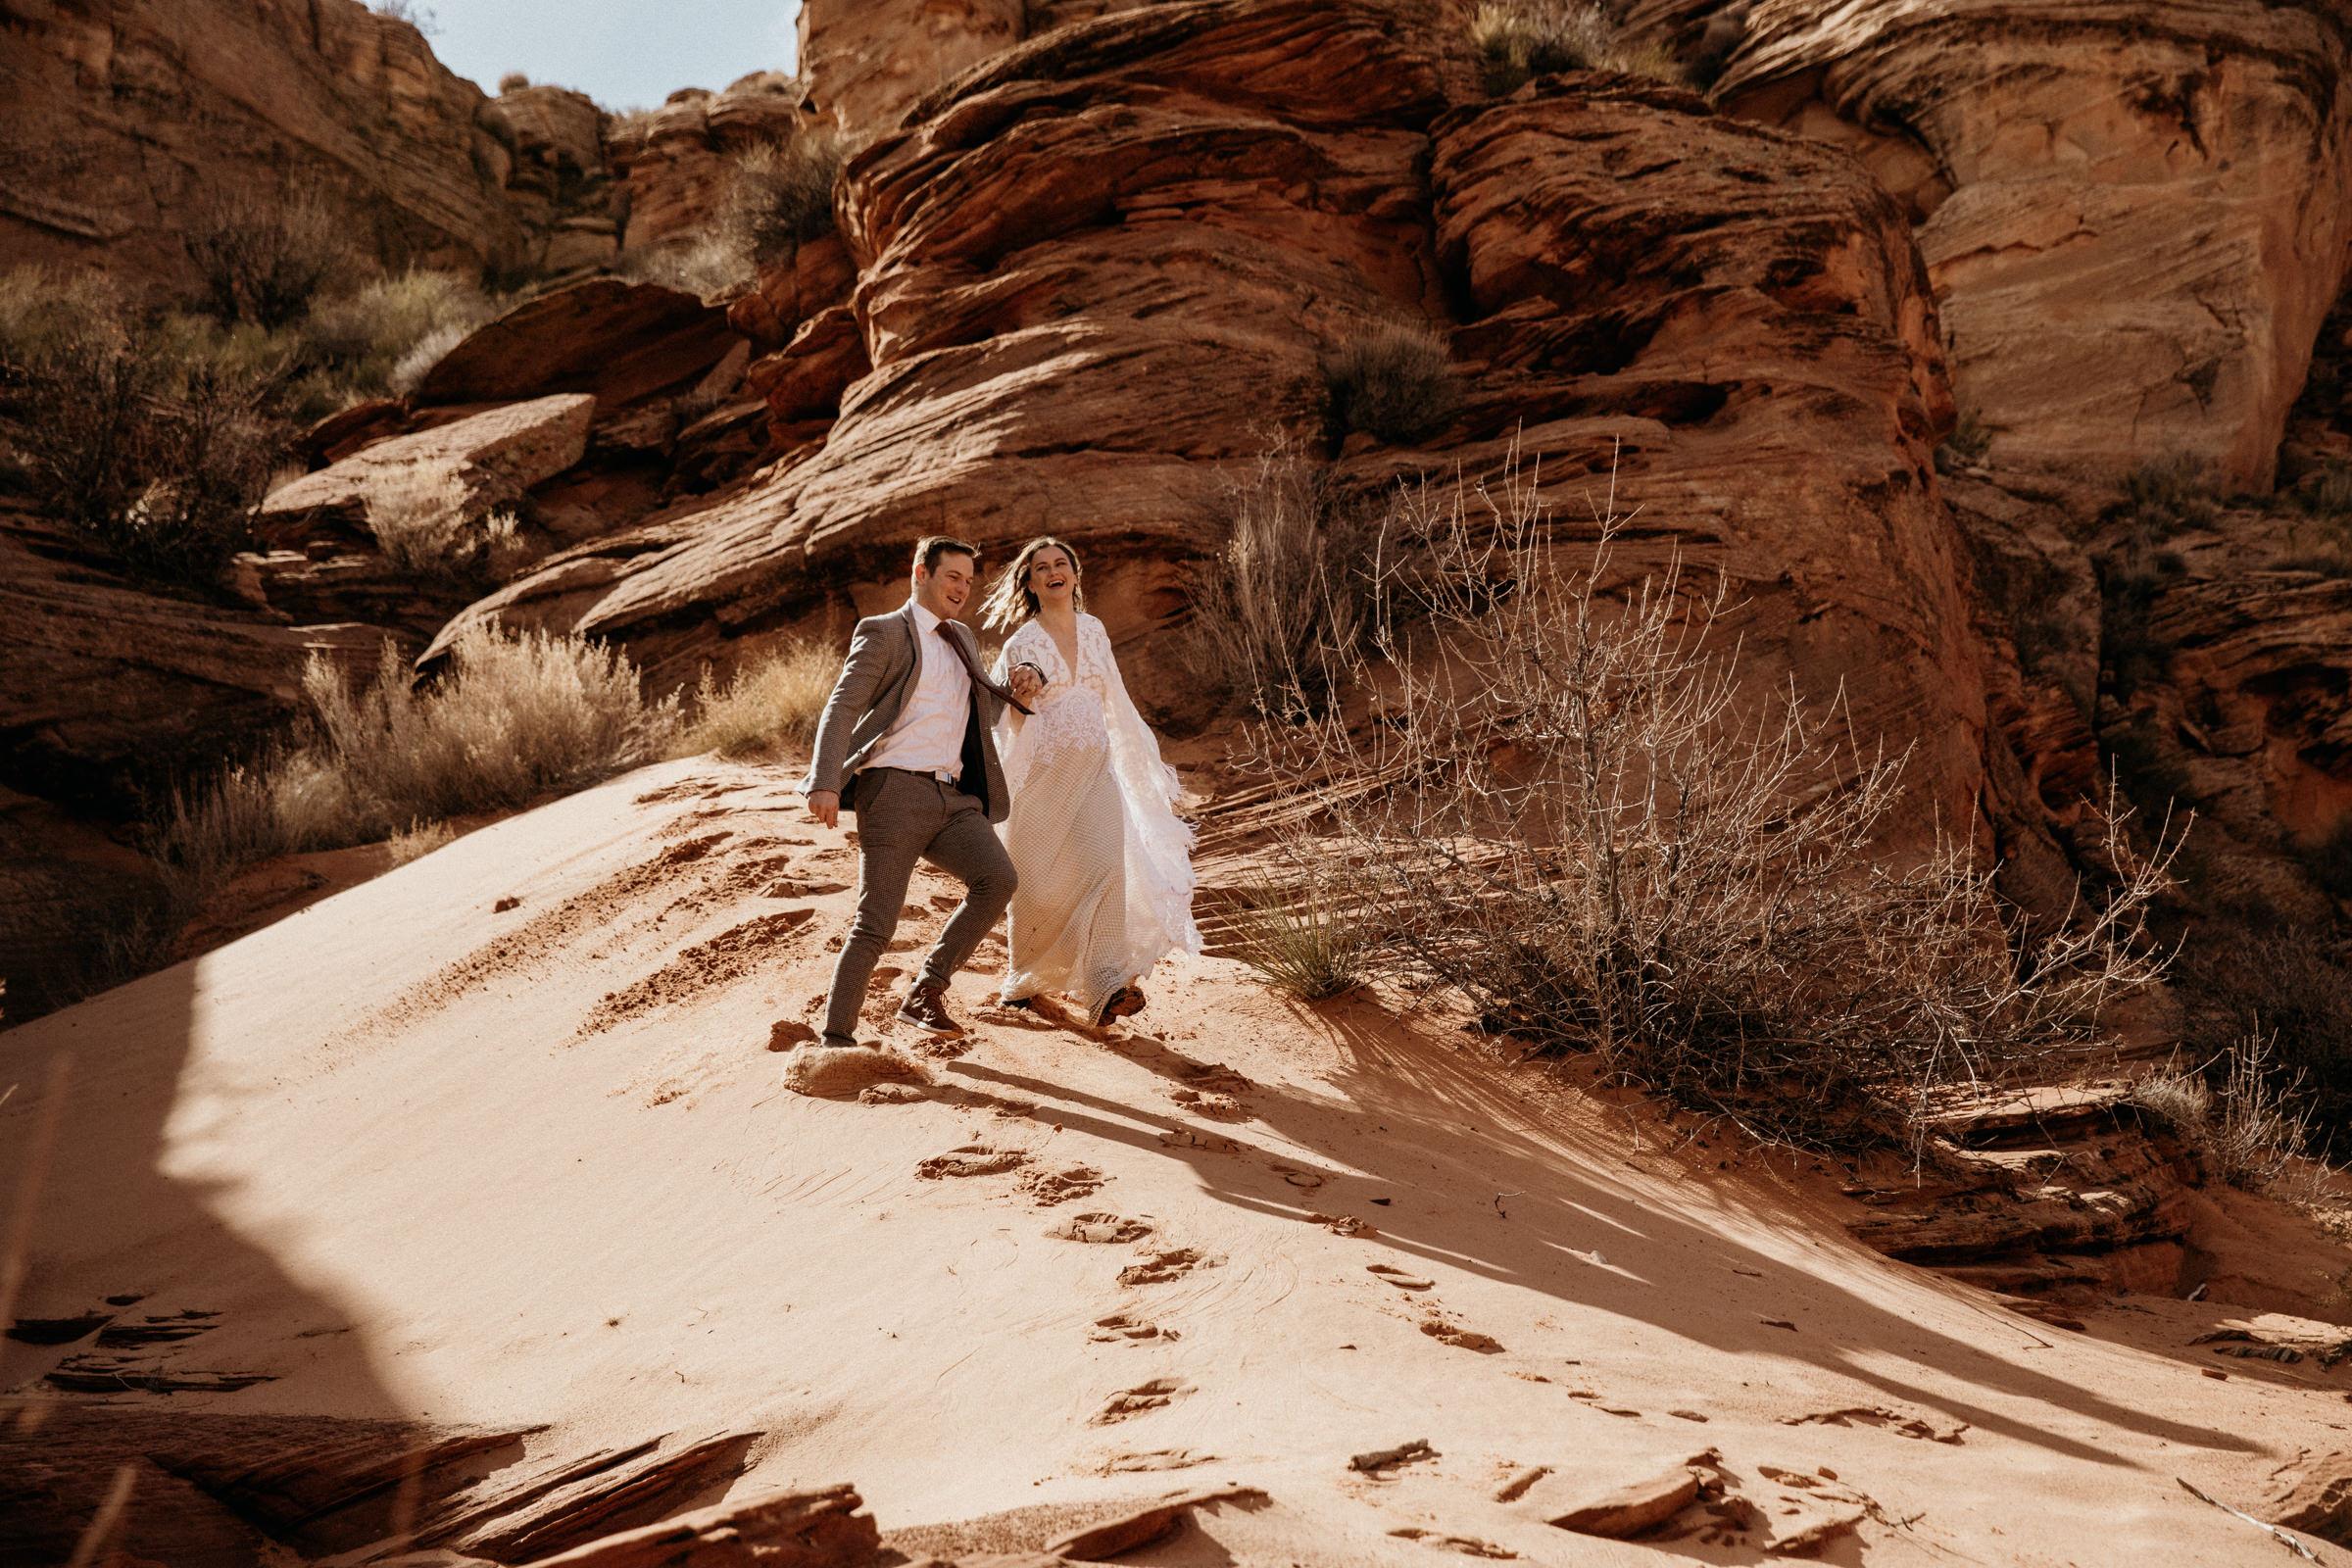 adventurous-wedding-photographer-in-the-desert.jpg